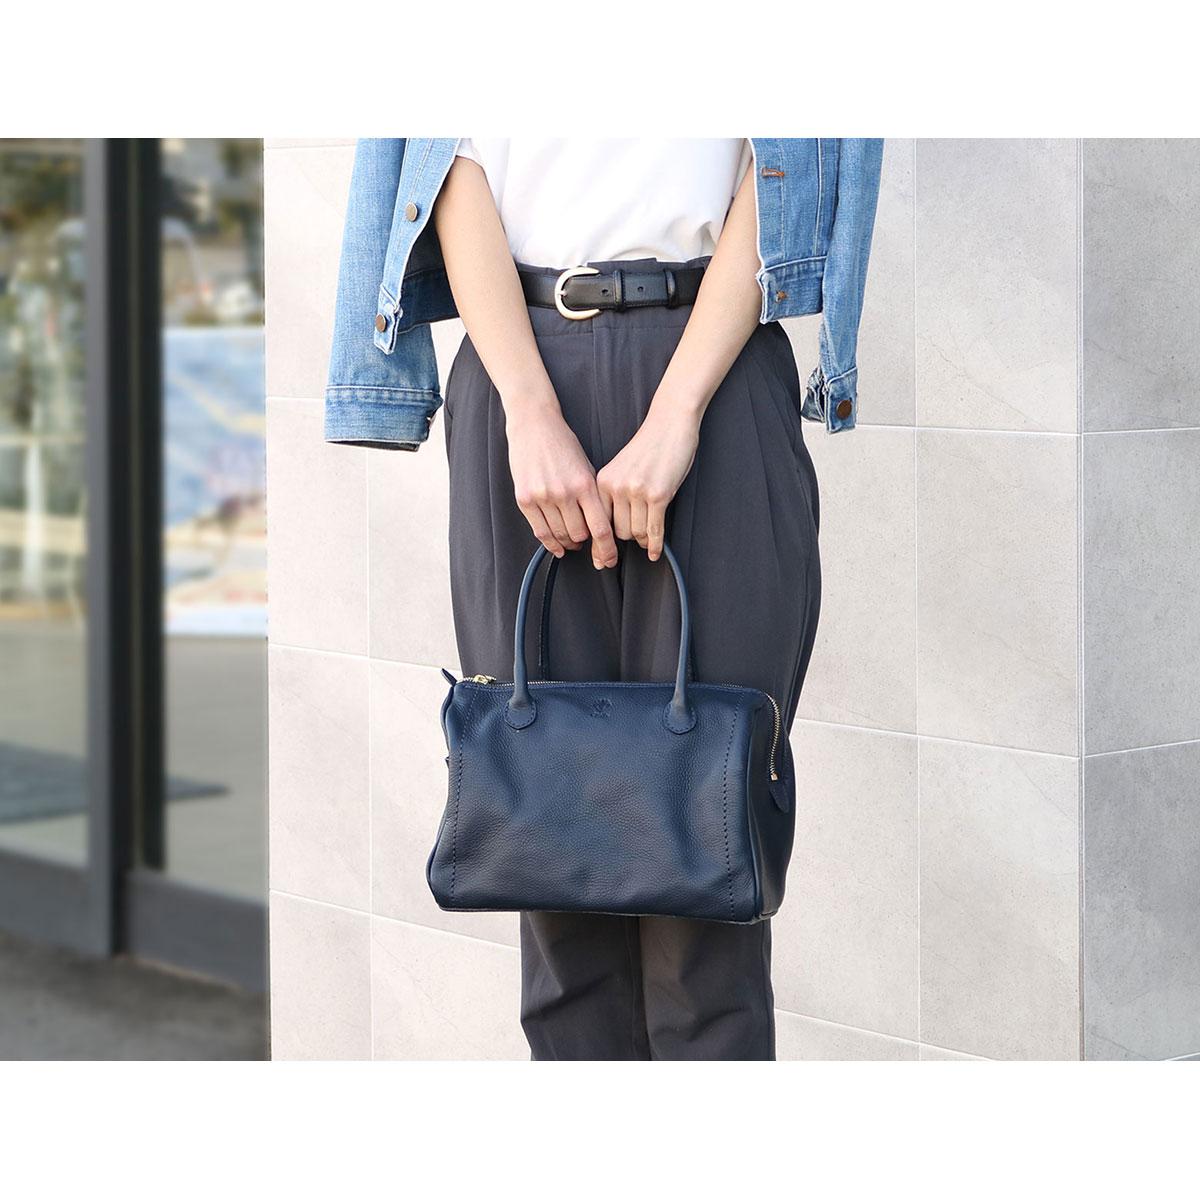 CI-VA handbag VOLANATO CIVA Lady's mini-Boston 1968VOLA